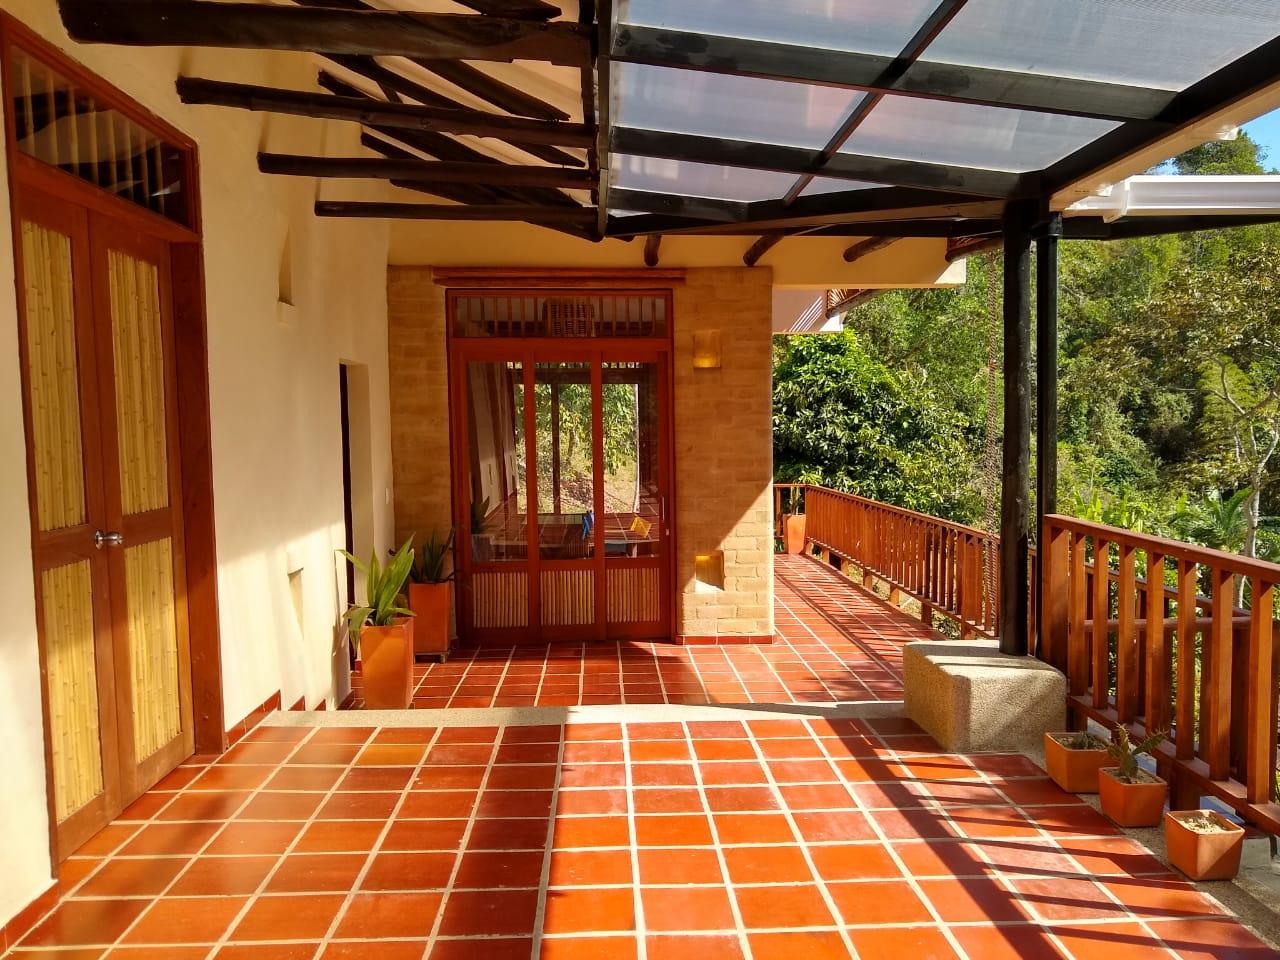 Casa Carolina y Stephanne - La Vega, Cundinamarca5